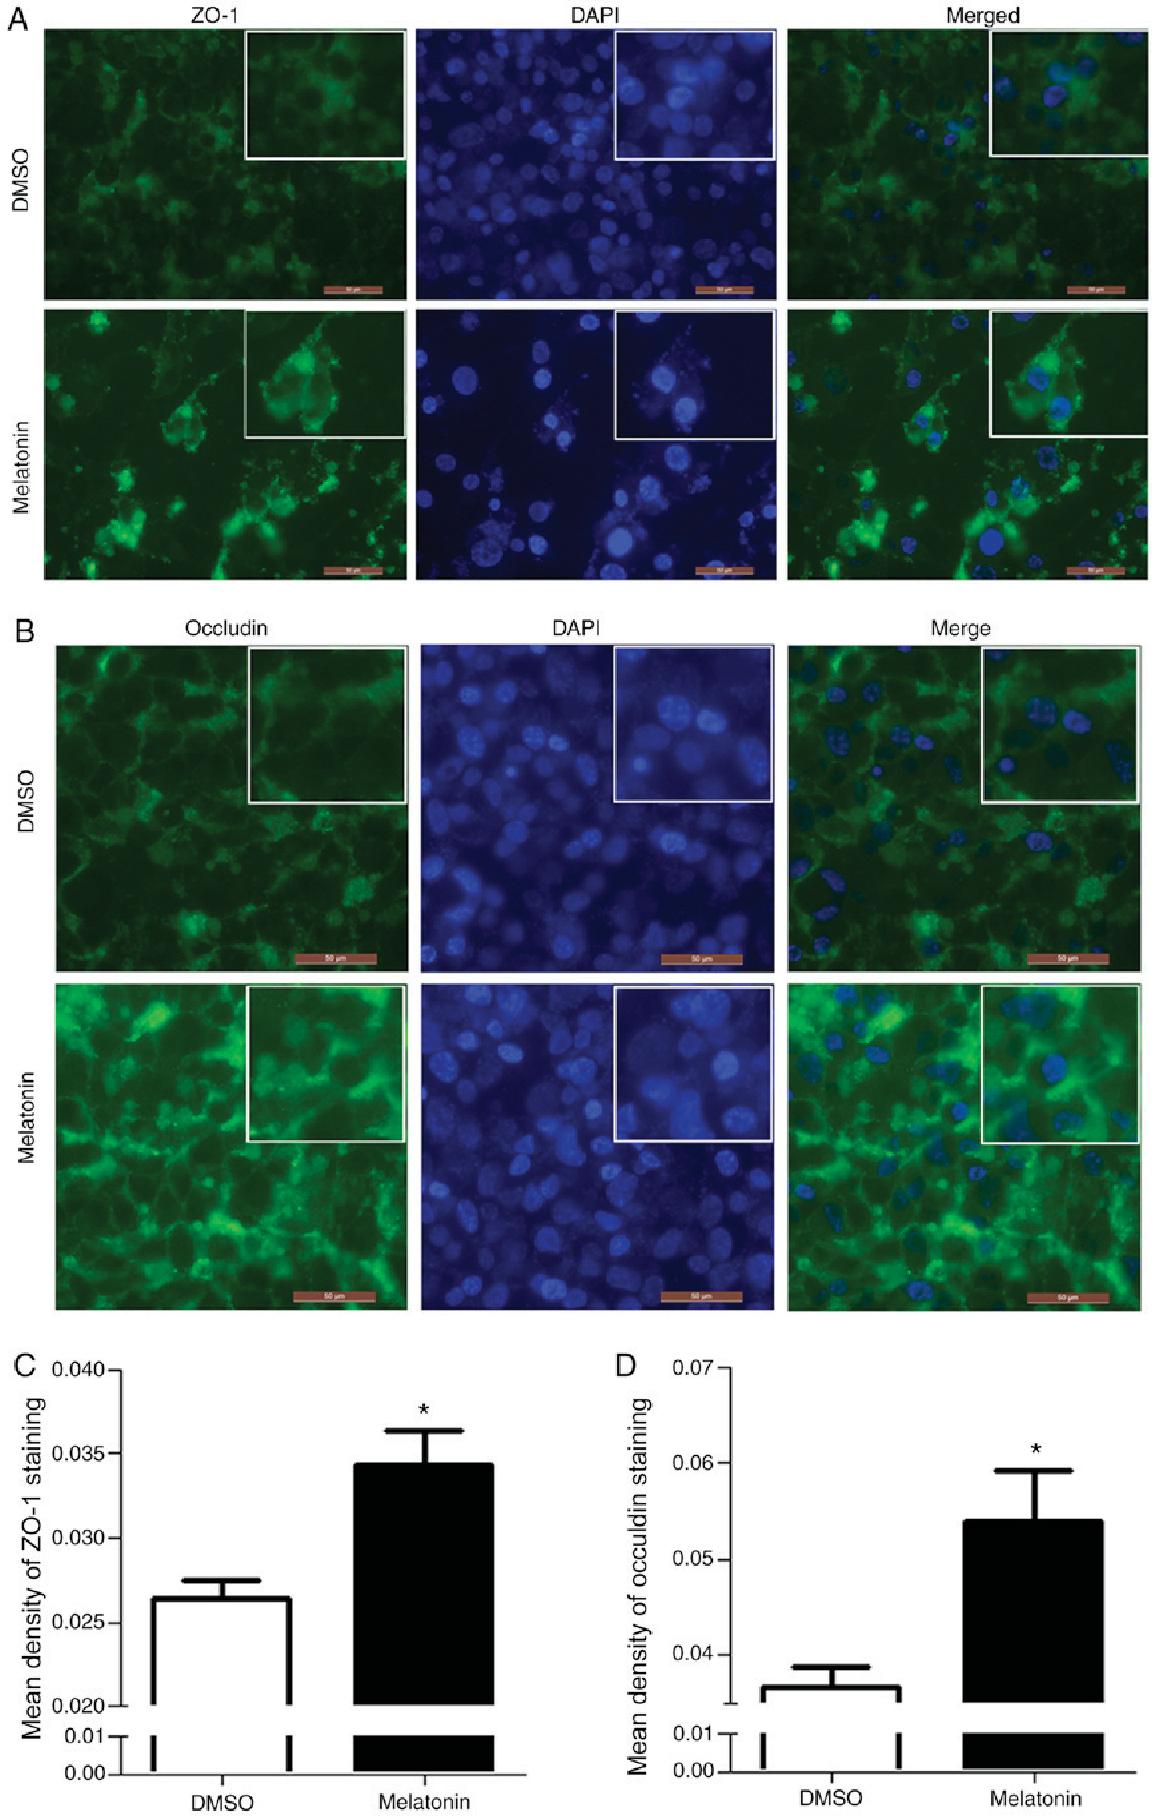 Pdf Melatonin Inhibits Colon Cancer Rko Cell Migration By Downregulating Rho Associated Protein Kinase Expression Via The P38 Mapk Signaling Pathway Semantic Scholar